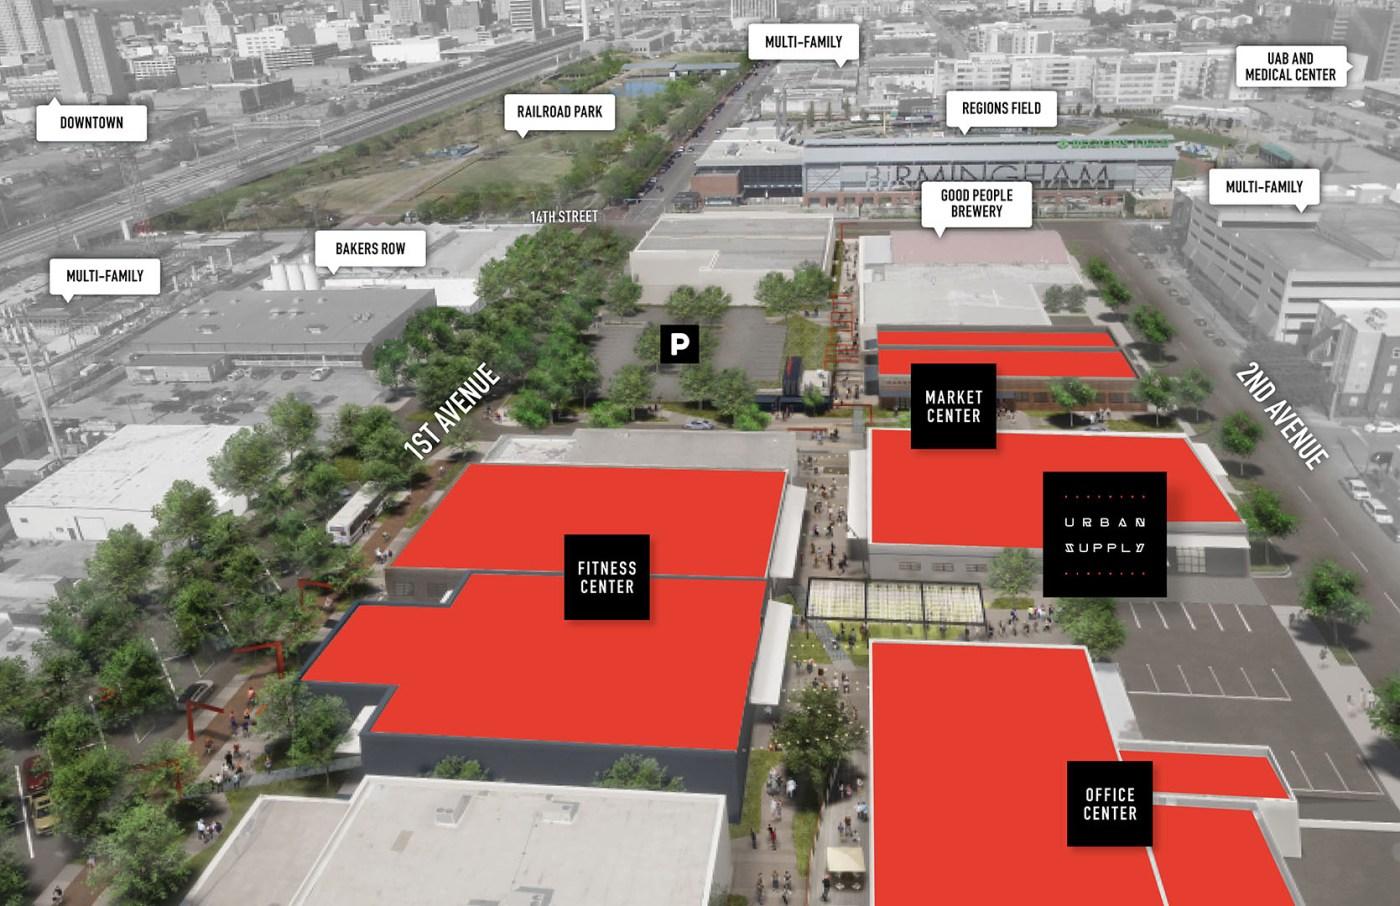 urban supply rendering